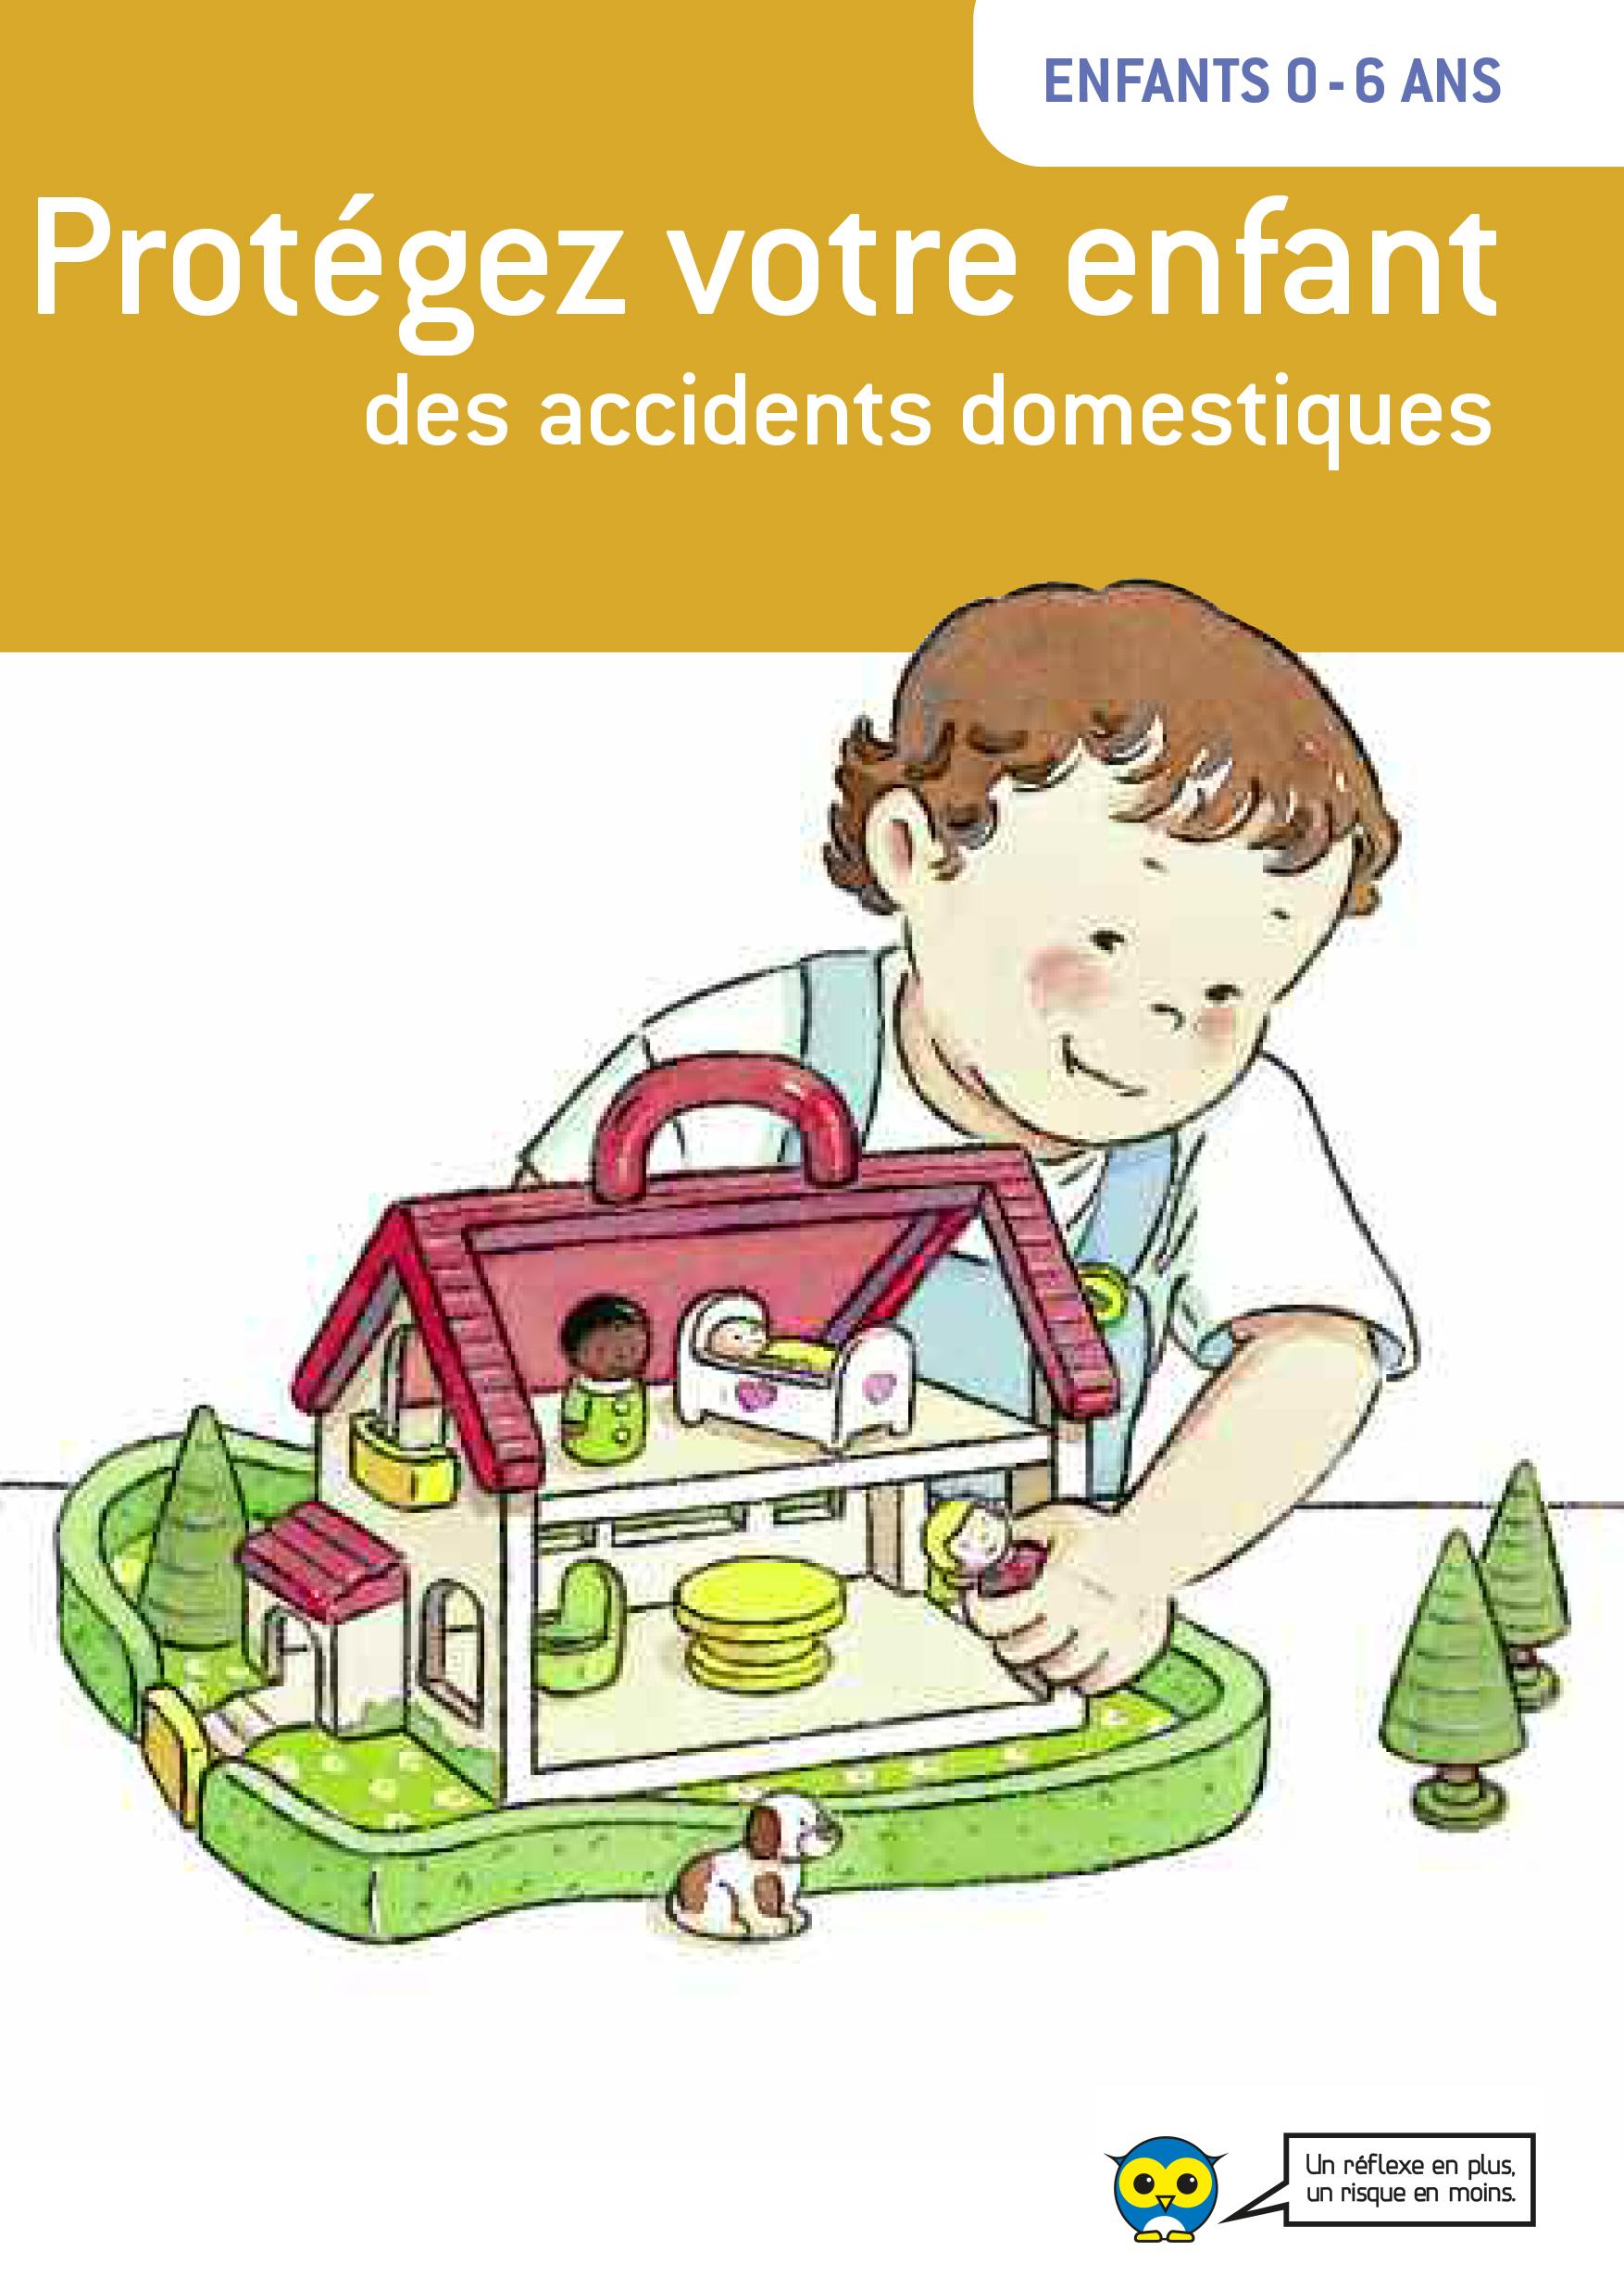 prot ger vos enfants des accidents domestiques l 39 espace enfance famille. Black Bedroom Furniture Sets. Home Design Ideas